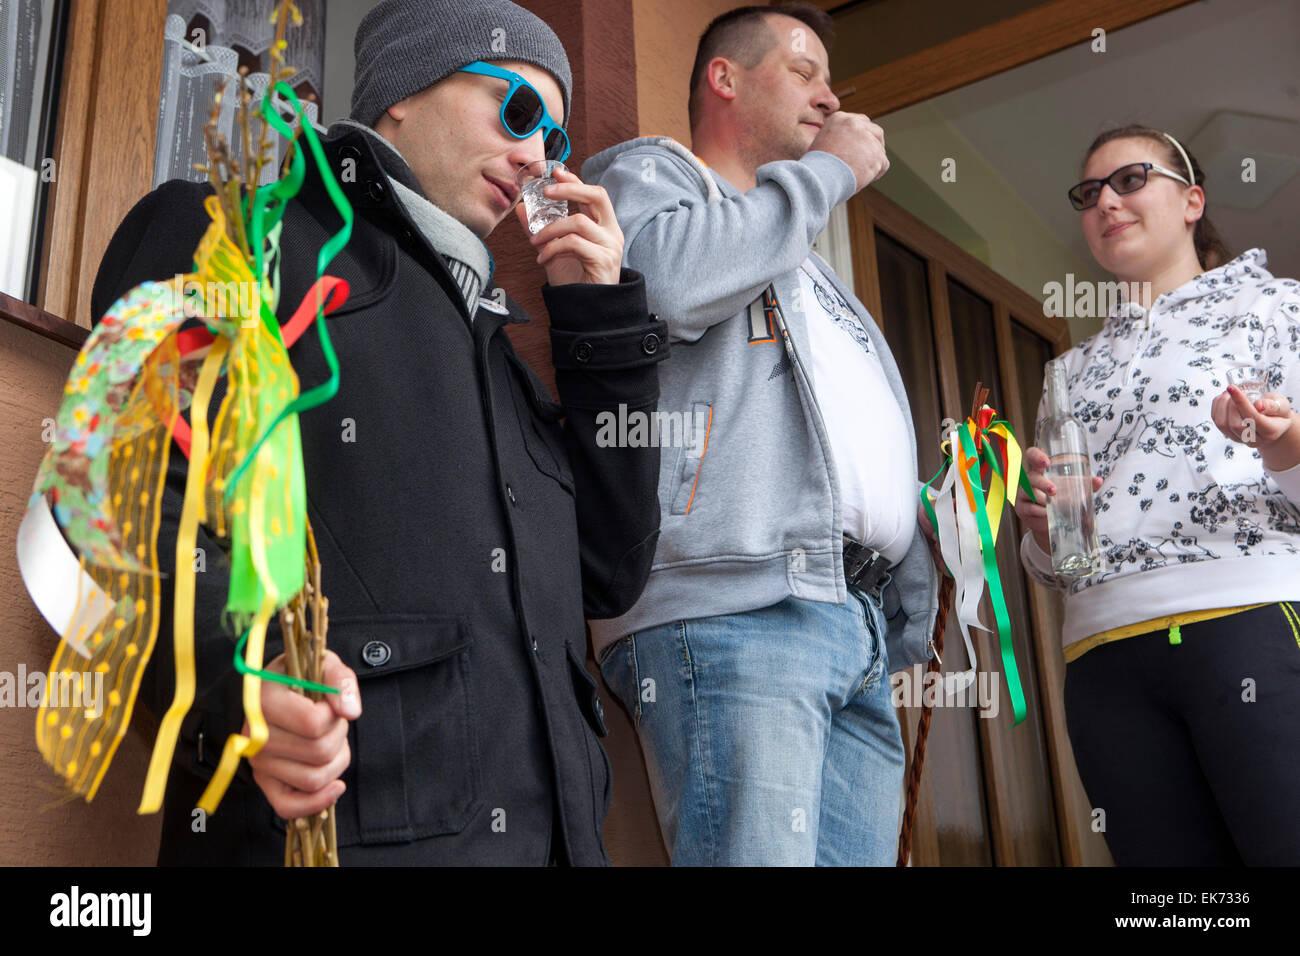 Easter Monday - refreshments for the boys carol, Sakvice, Southern Moravia, Czech Republic Stock Photo